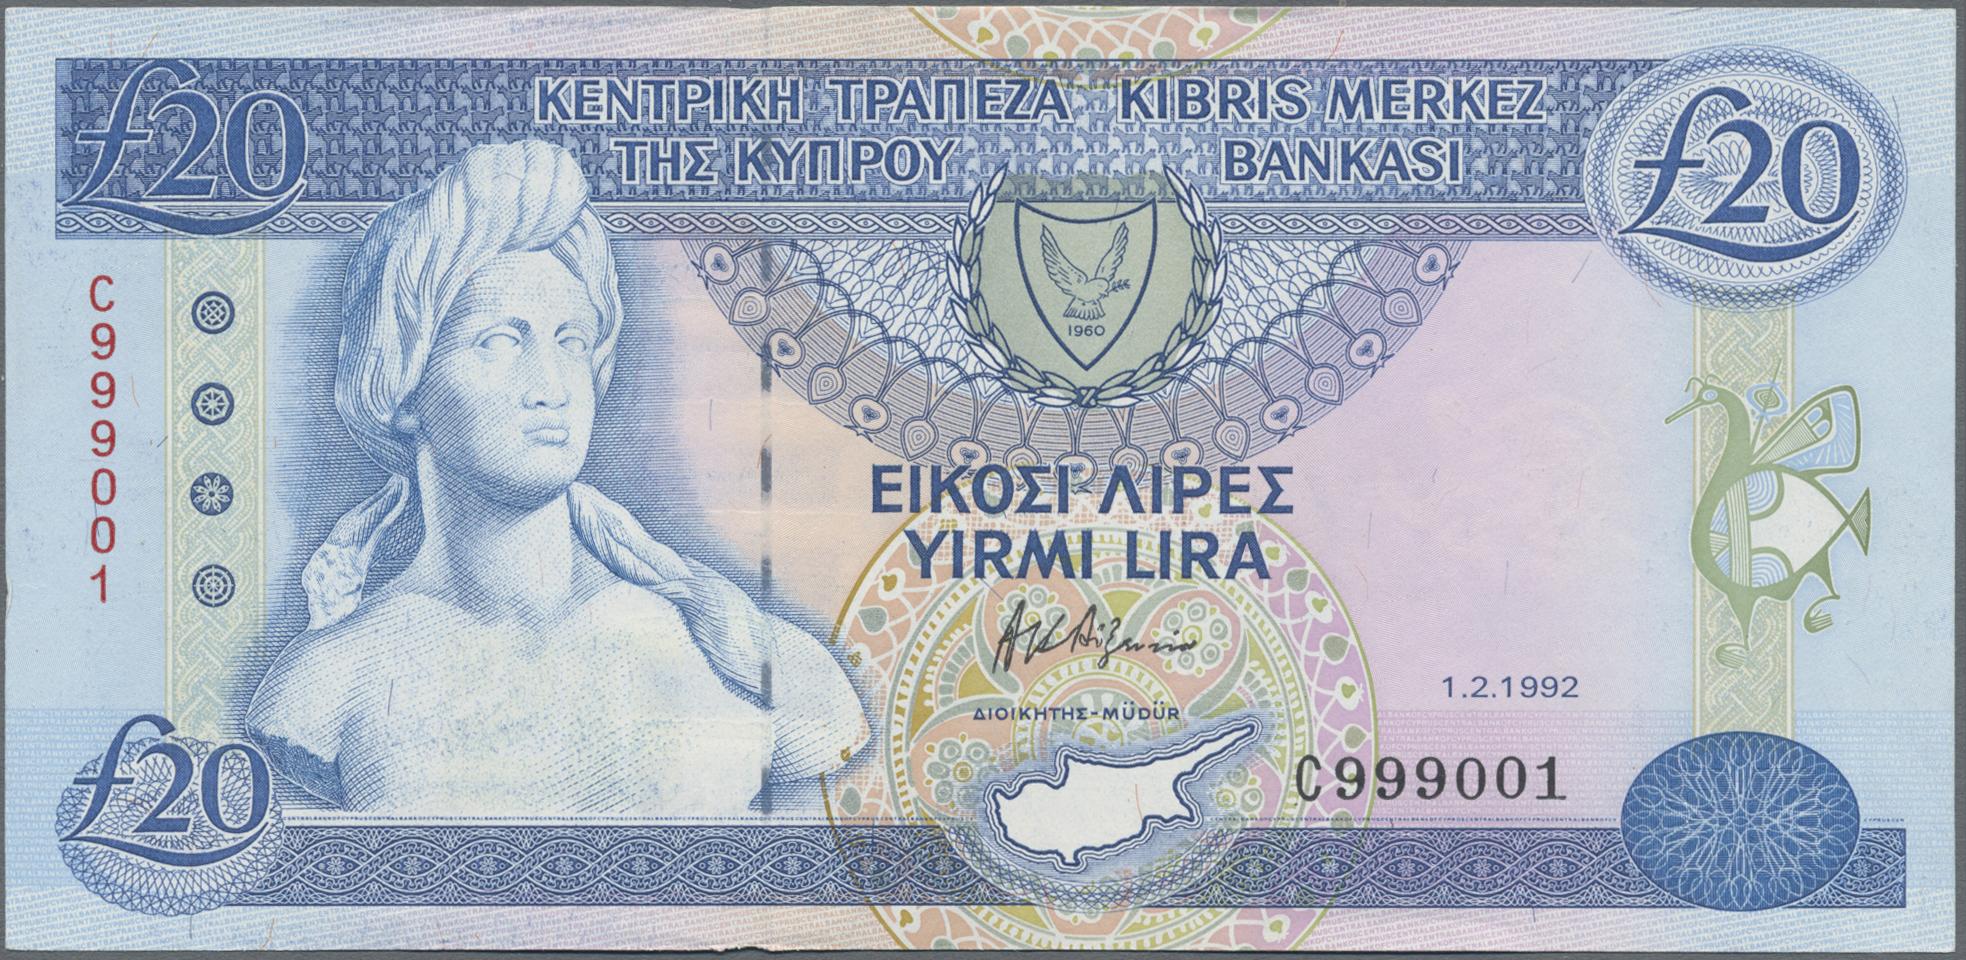 Lot 00164 - Cyprus / Zypern   Banknoten  -  Auktionshaus Christoph Gärtner GmbH & Co. KG Sale #48 The Banknotes